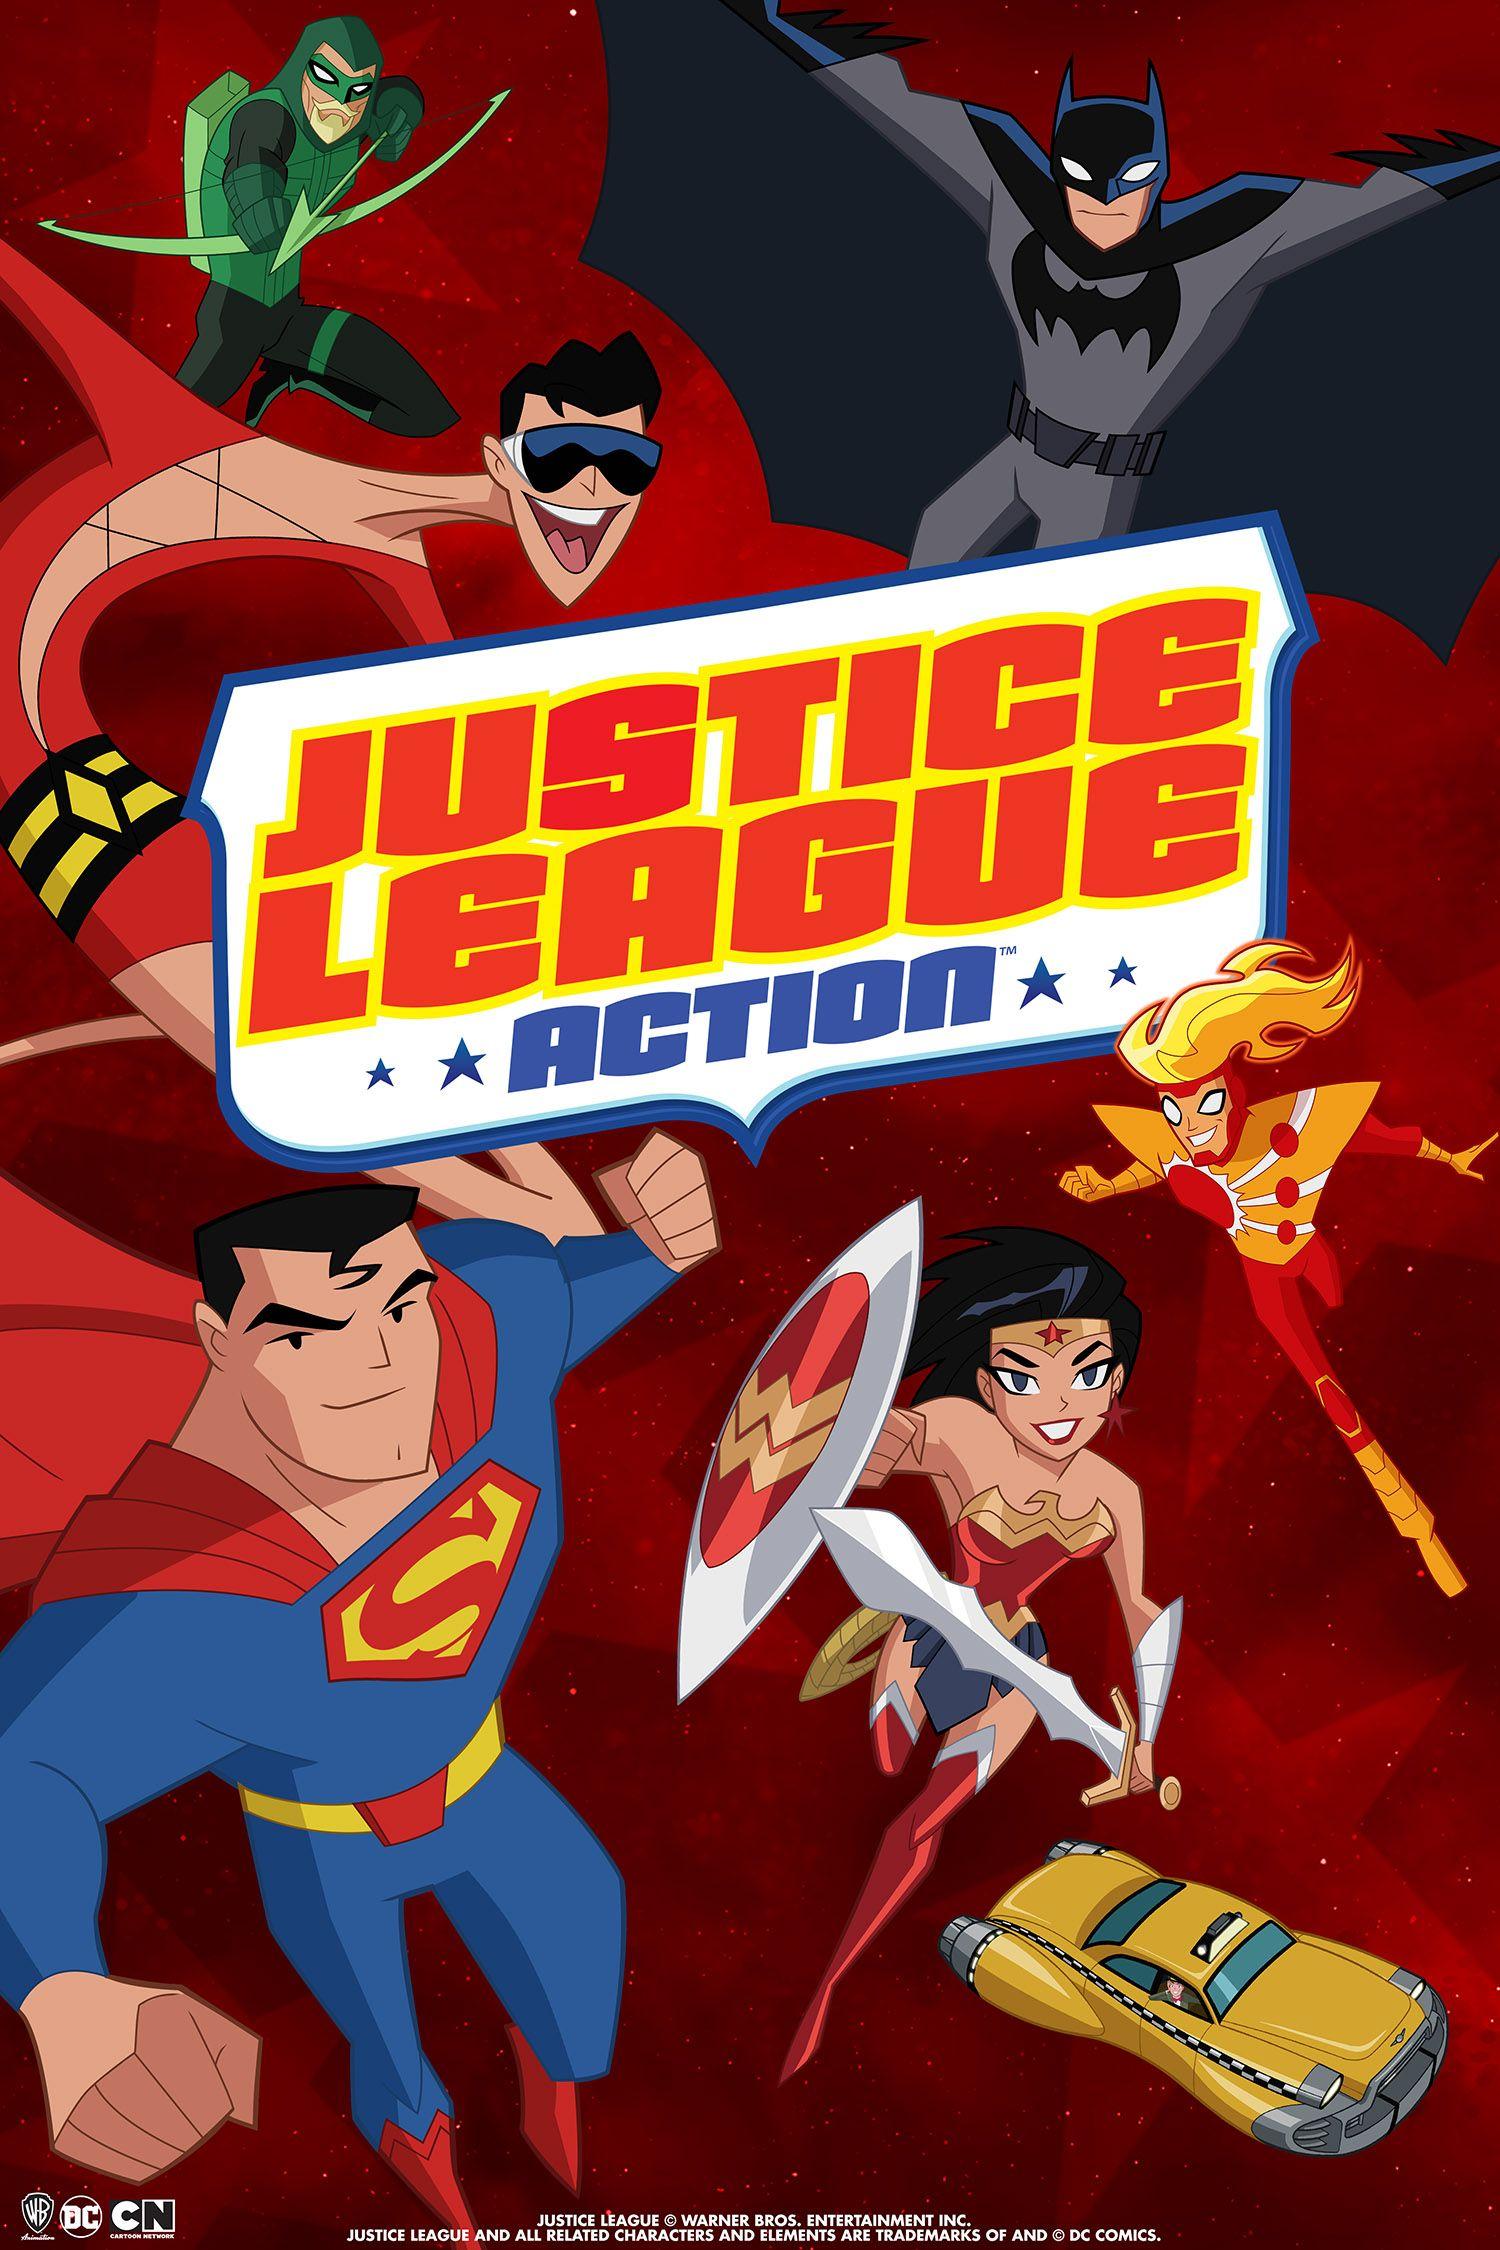 Justice League Action Review: Heroics Meet Humor | Collider